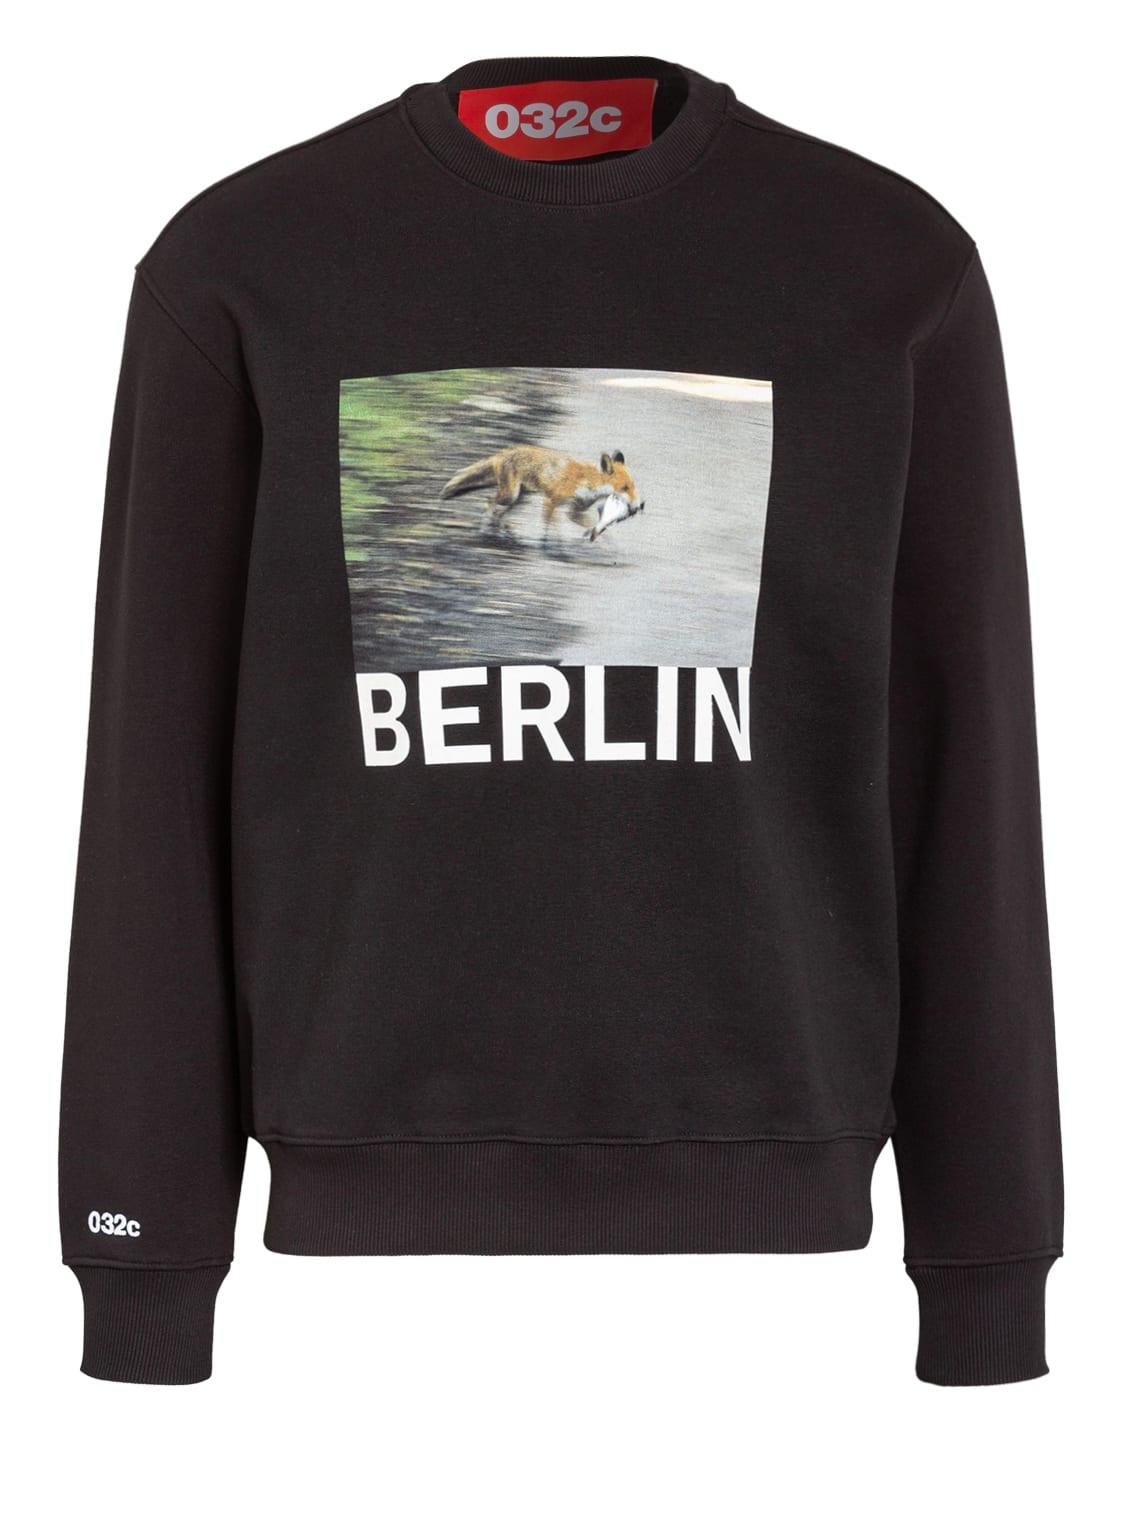 Image of 032c Sweatshirt schwarz